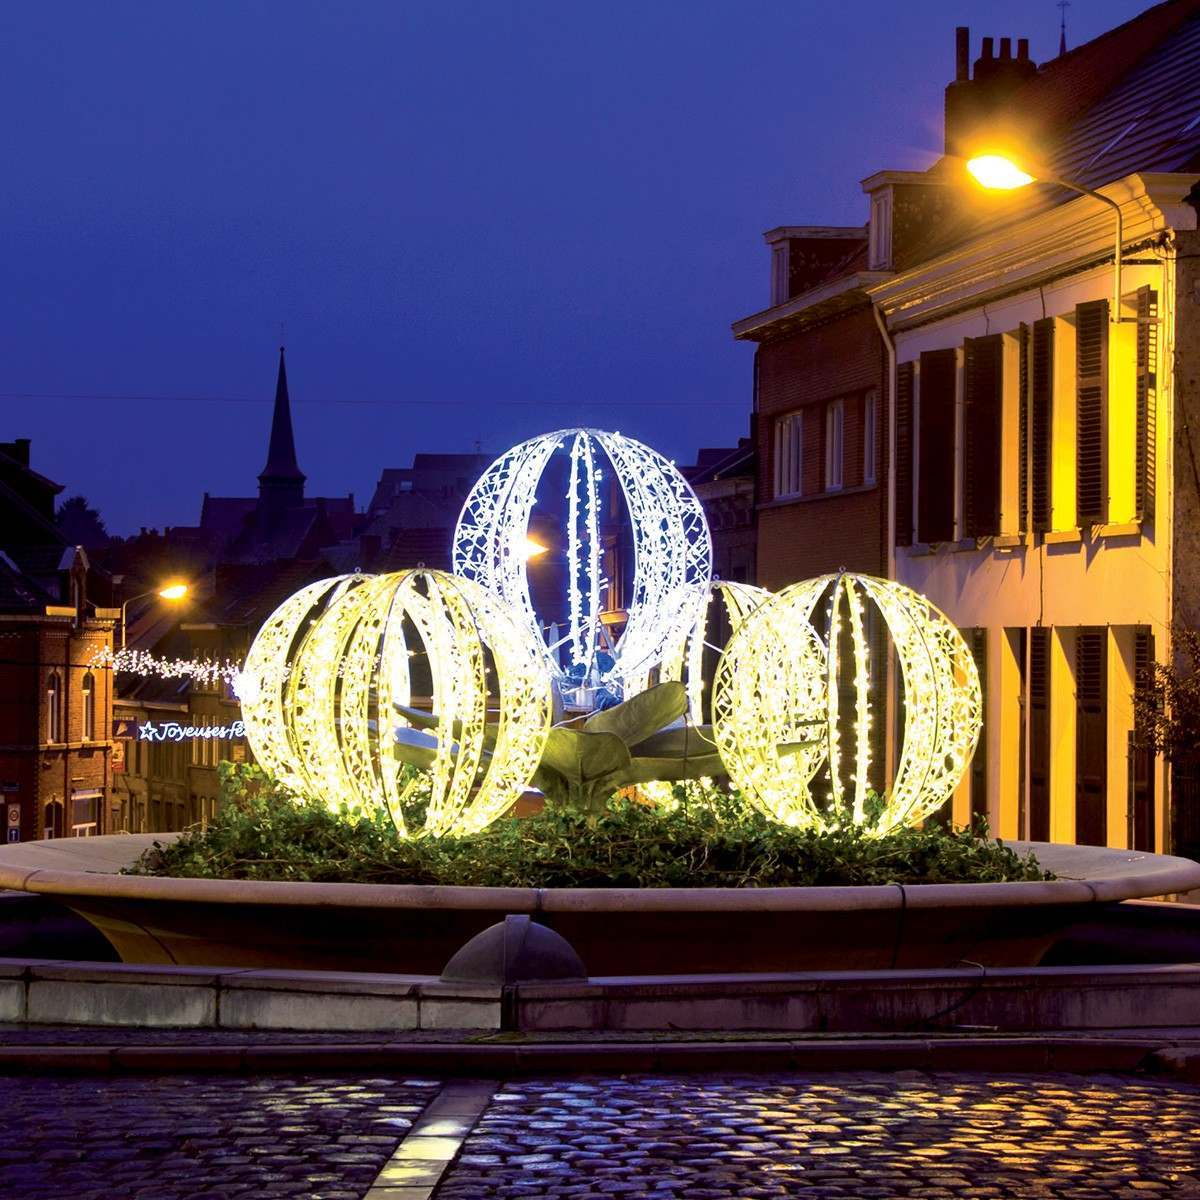 Illuminated Warm White `Riga` Sphere, 1.35m